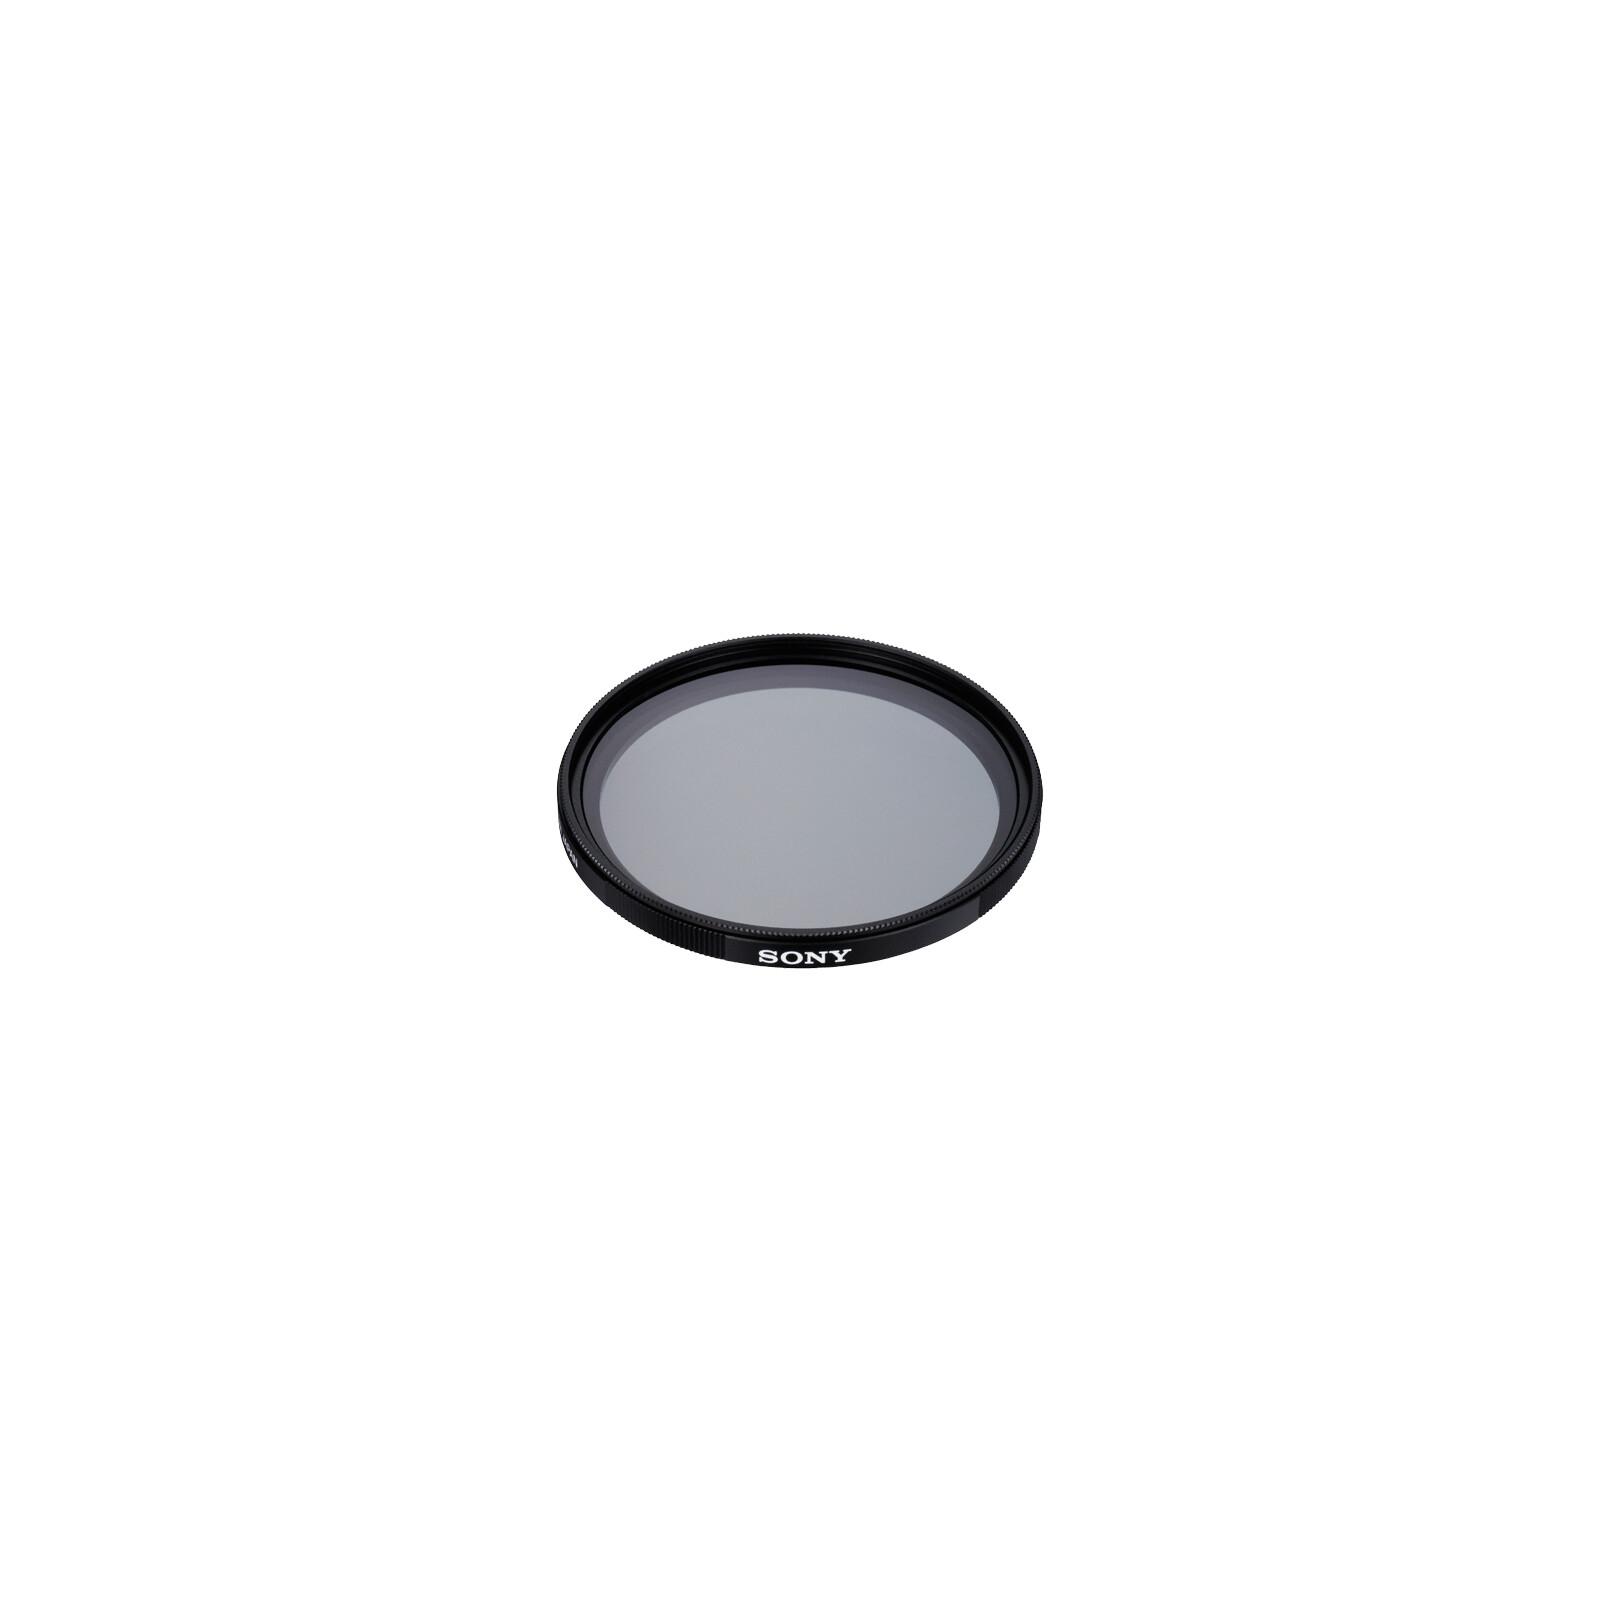 Sony VF-49CPAM POL Circular 49mm